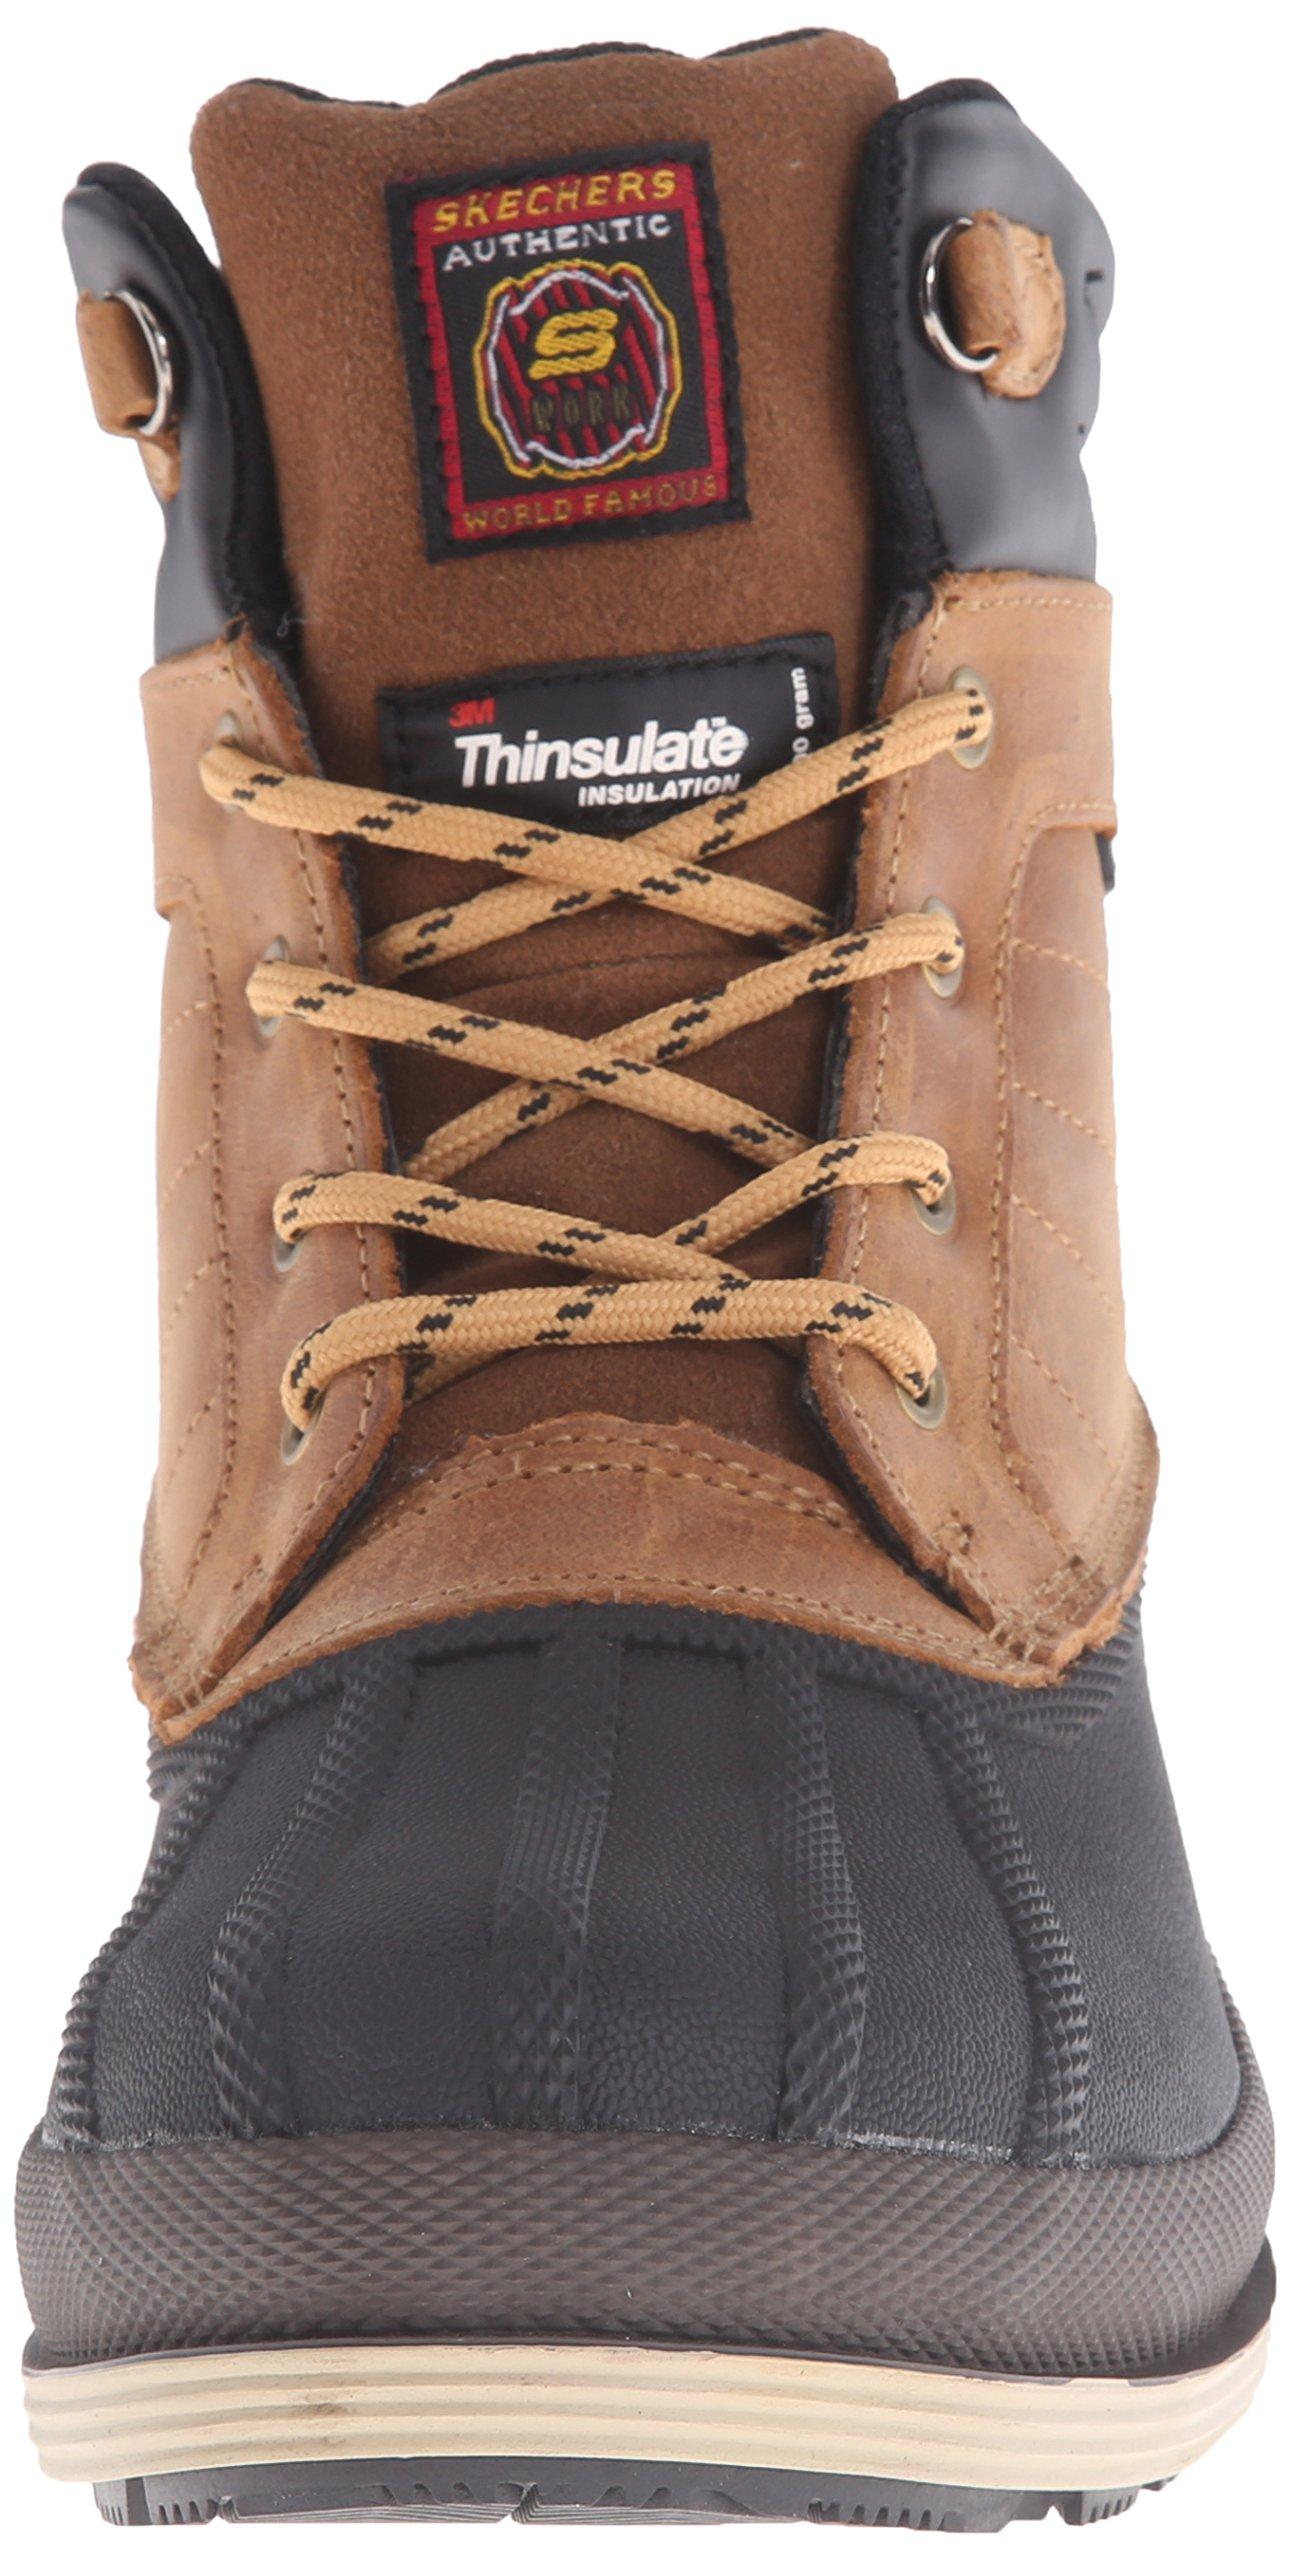 Skechers for Work Women's Duck Rain Boot, Brown, 5.5 M US by Skechers (Image #4)